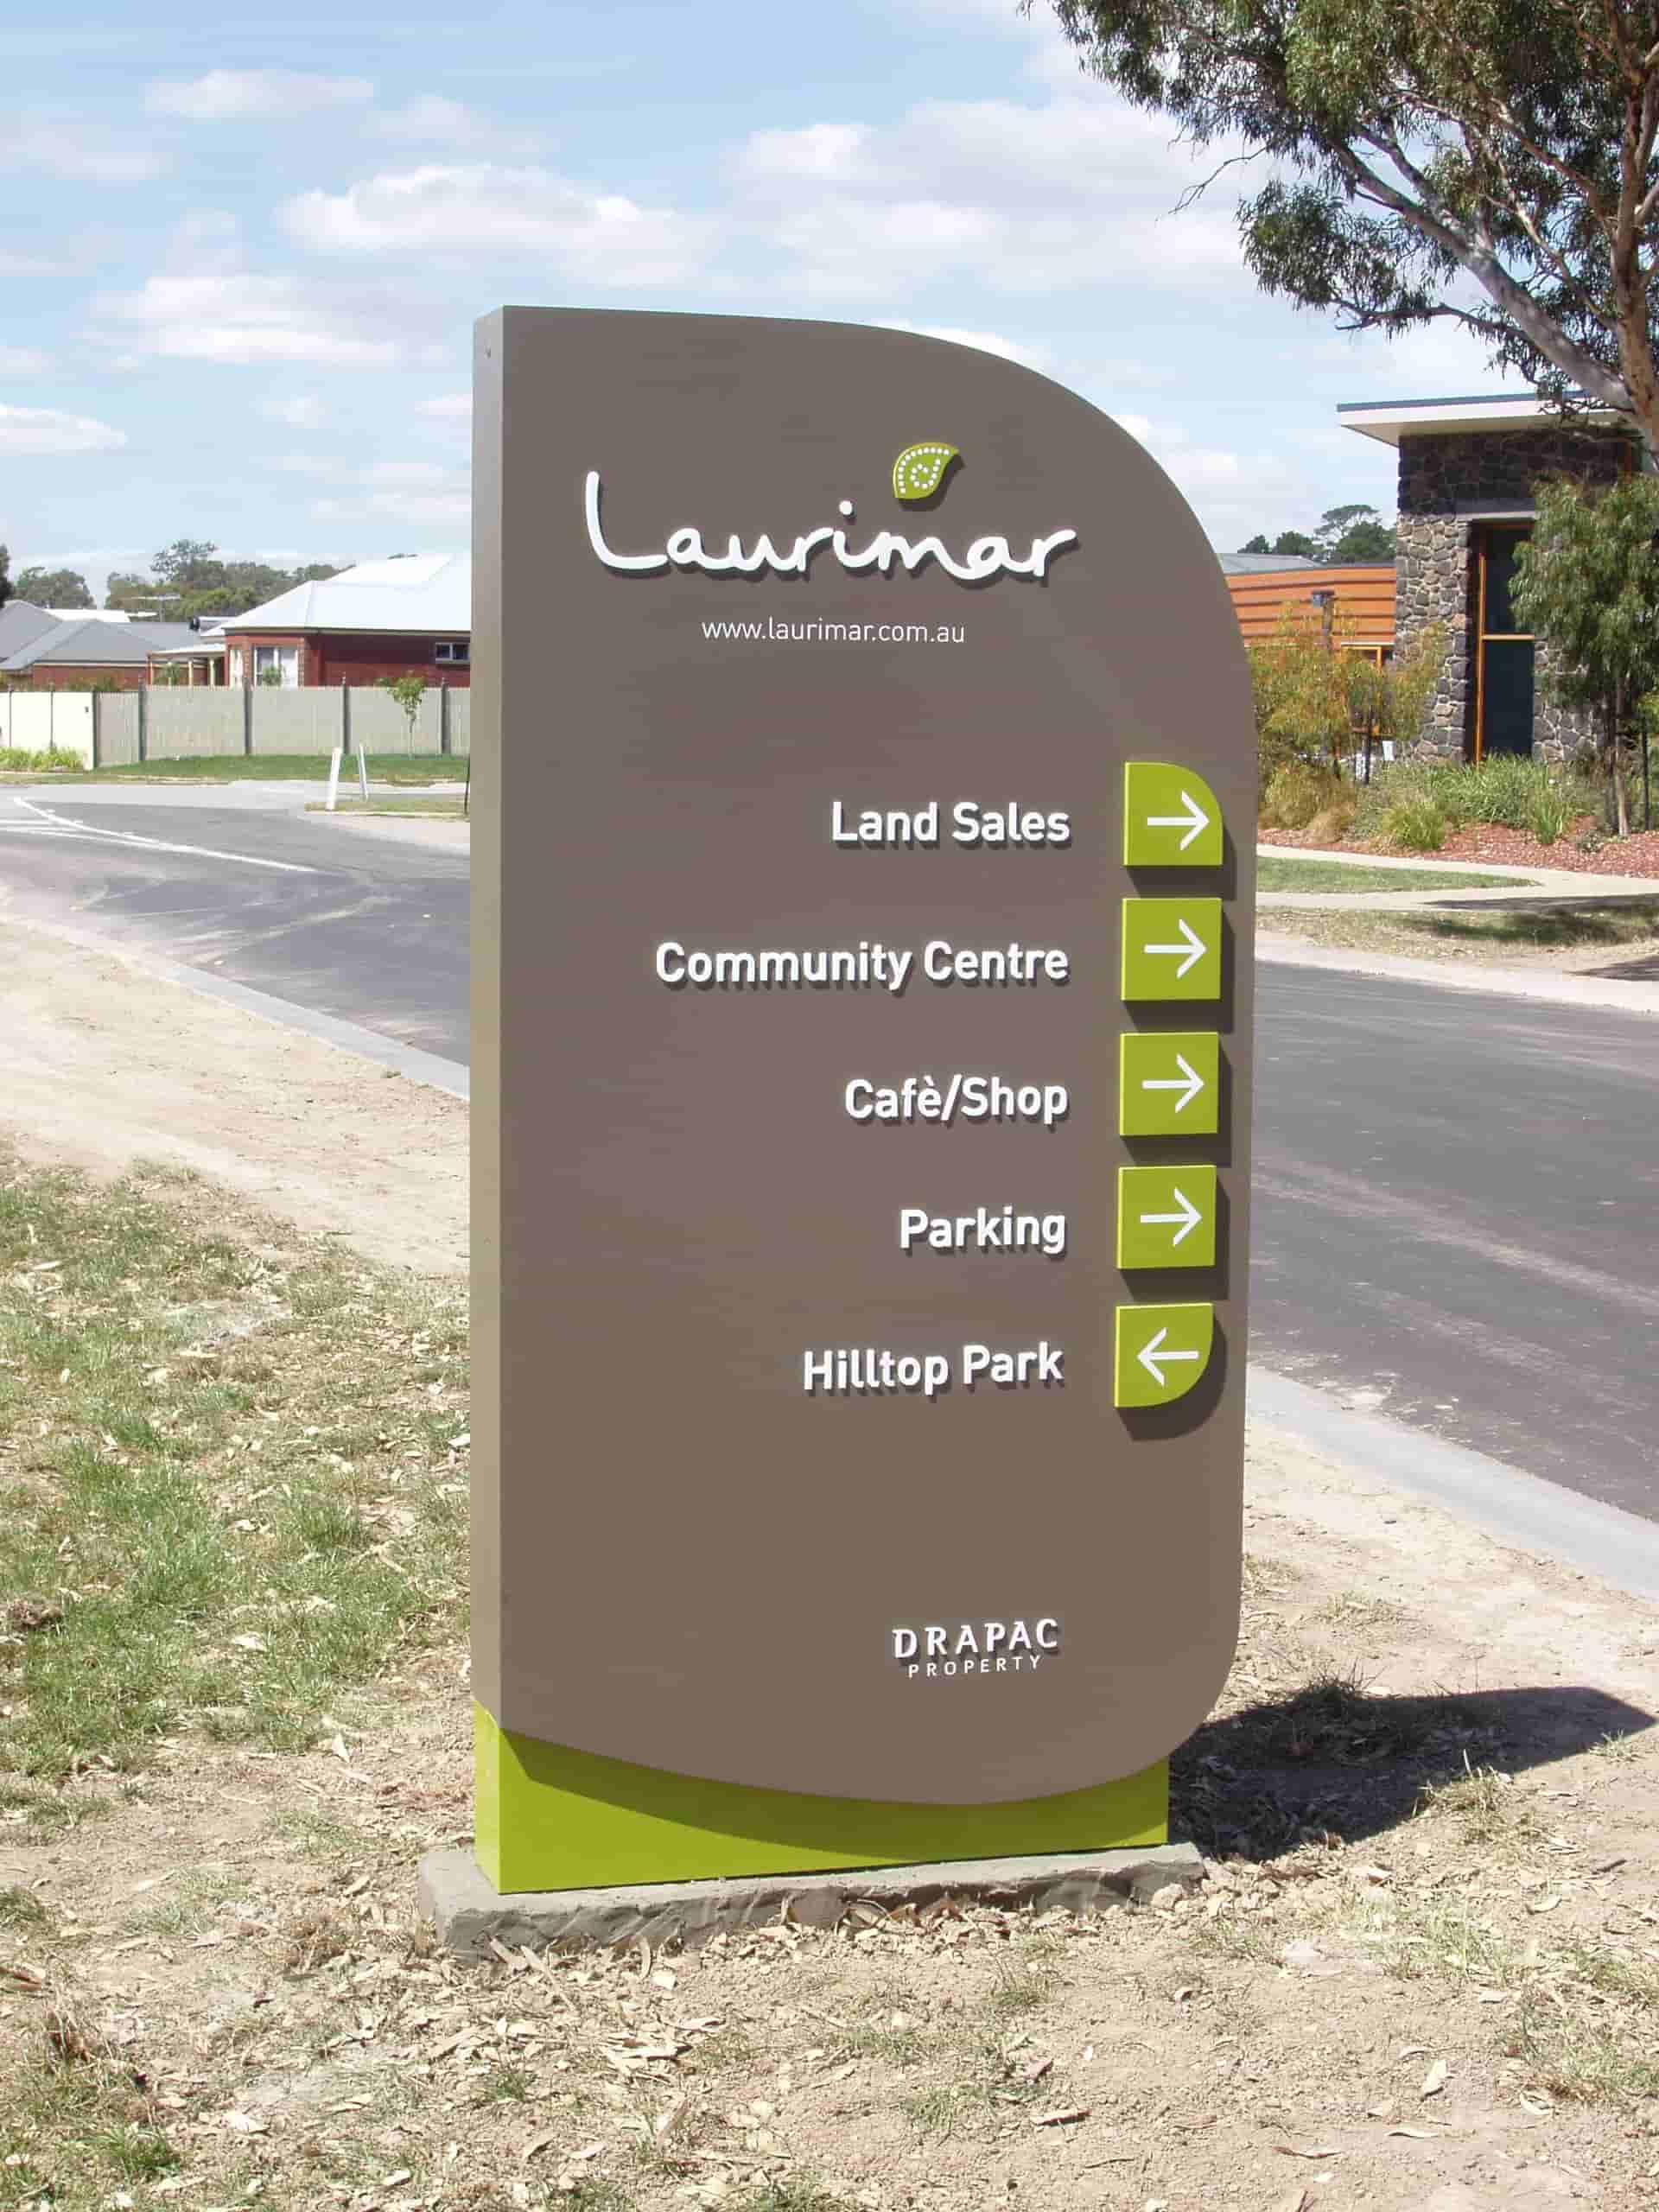 laurimar garden signage pylon